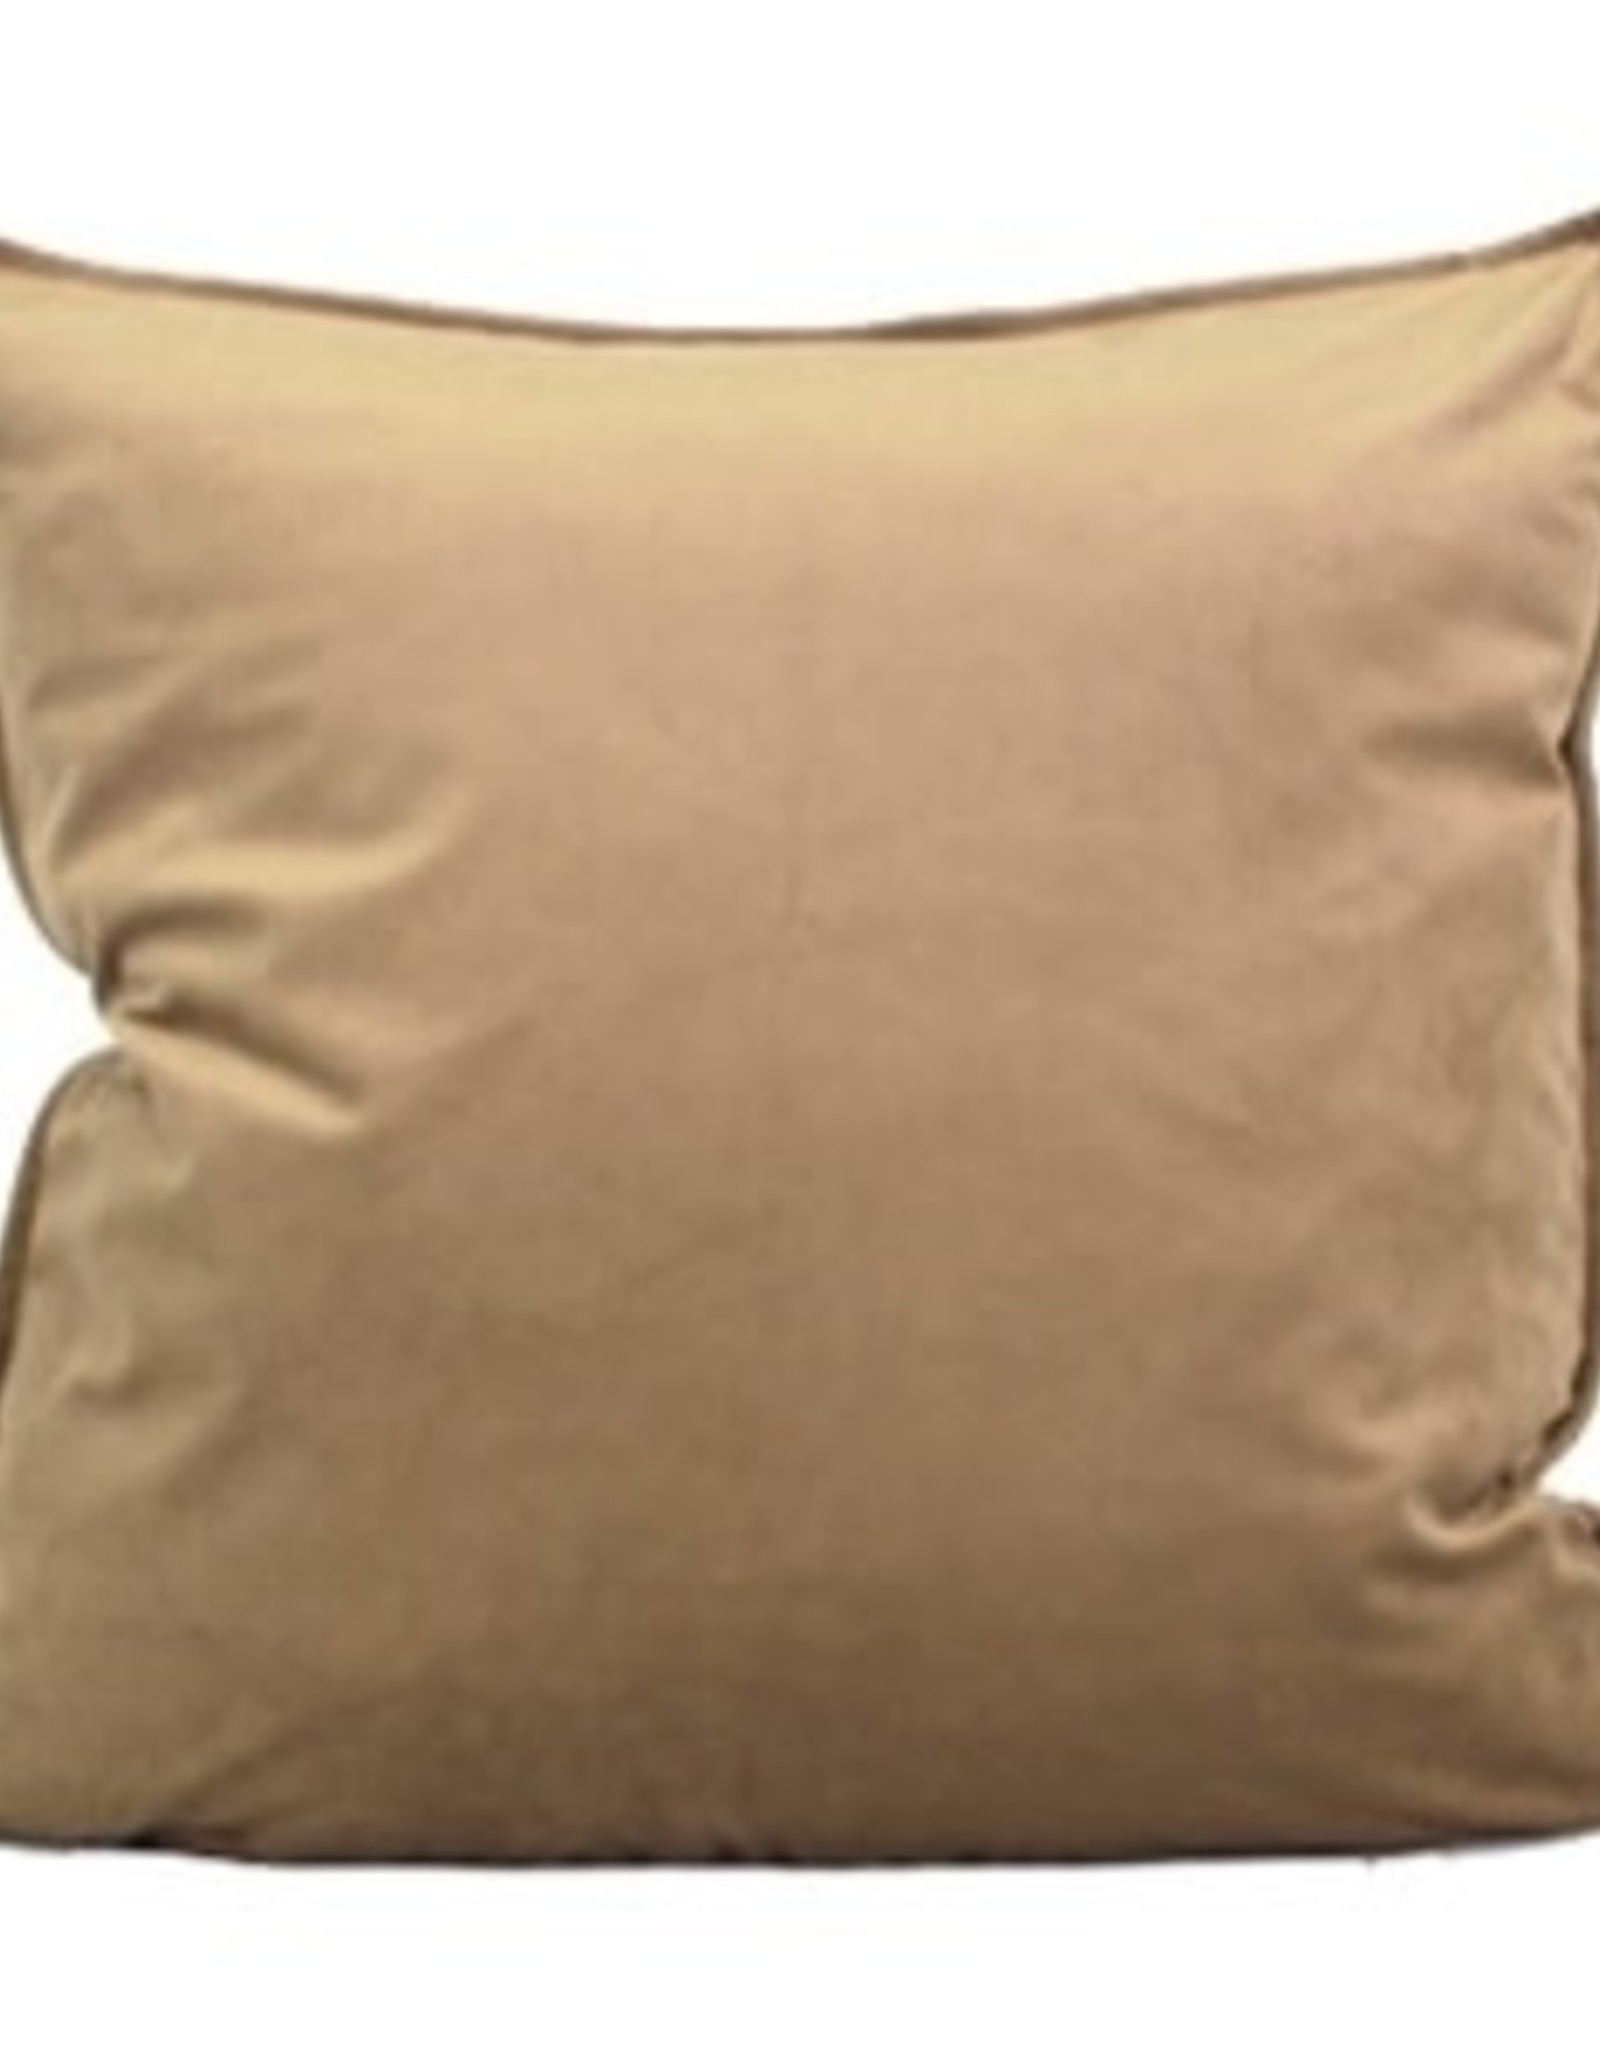 Daniadown Cushions Daniadown Velvet Euro Taupe**